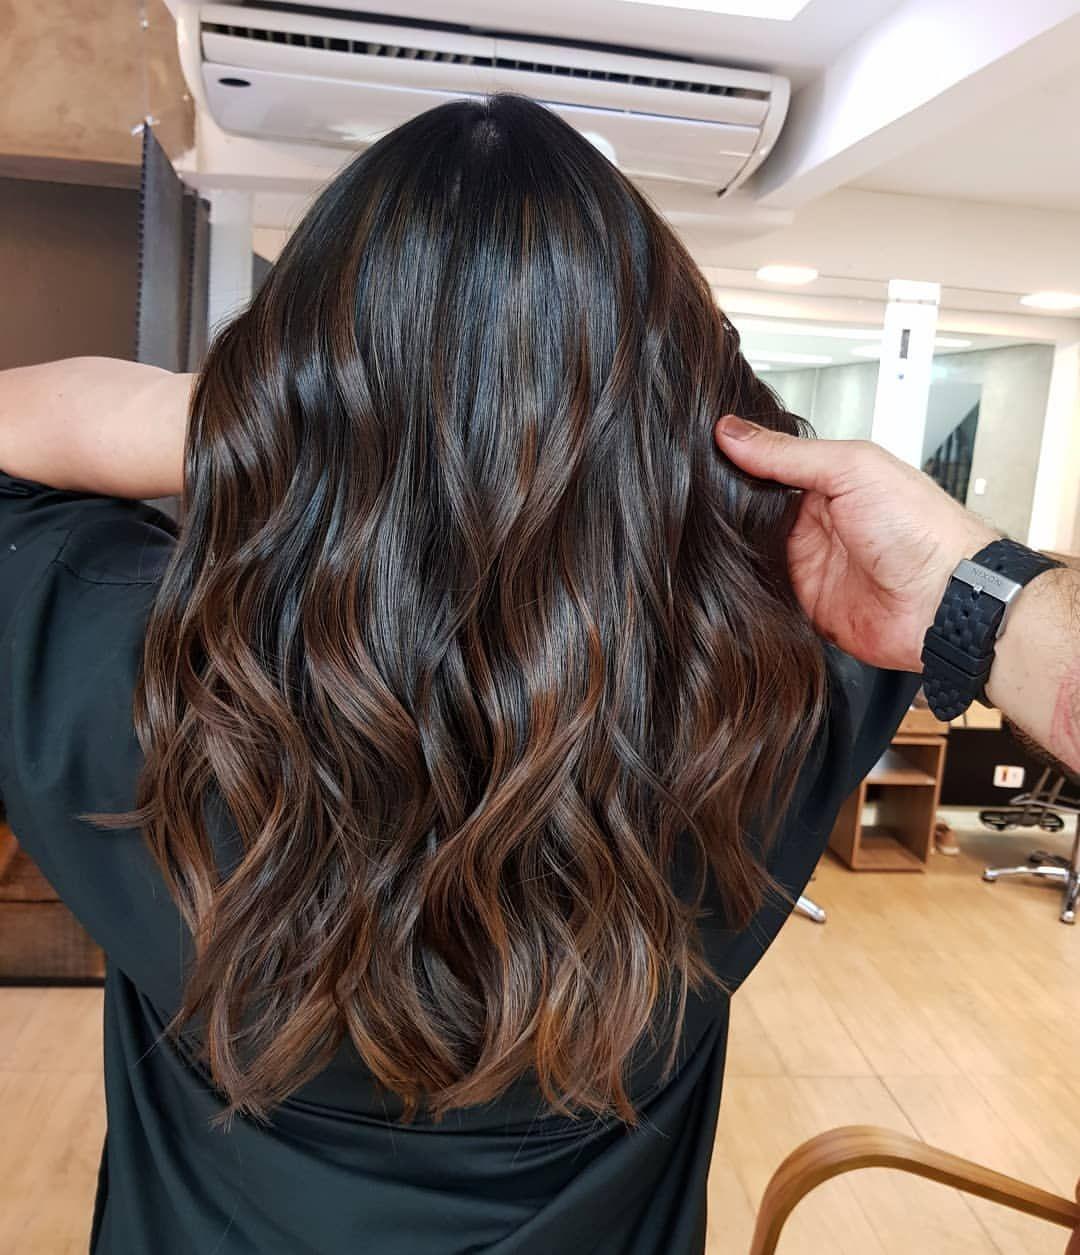 "Douglas Garcia Hairstylist ️ on Instagram: ""Morena iluminada ���"""